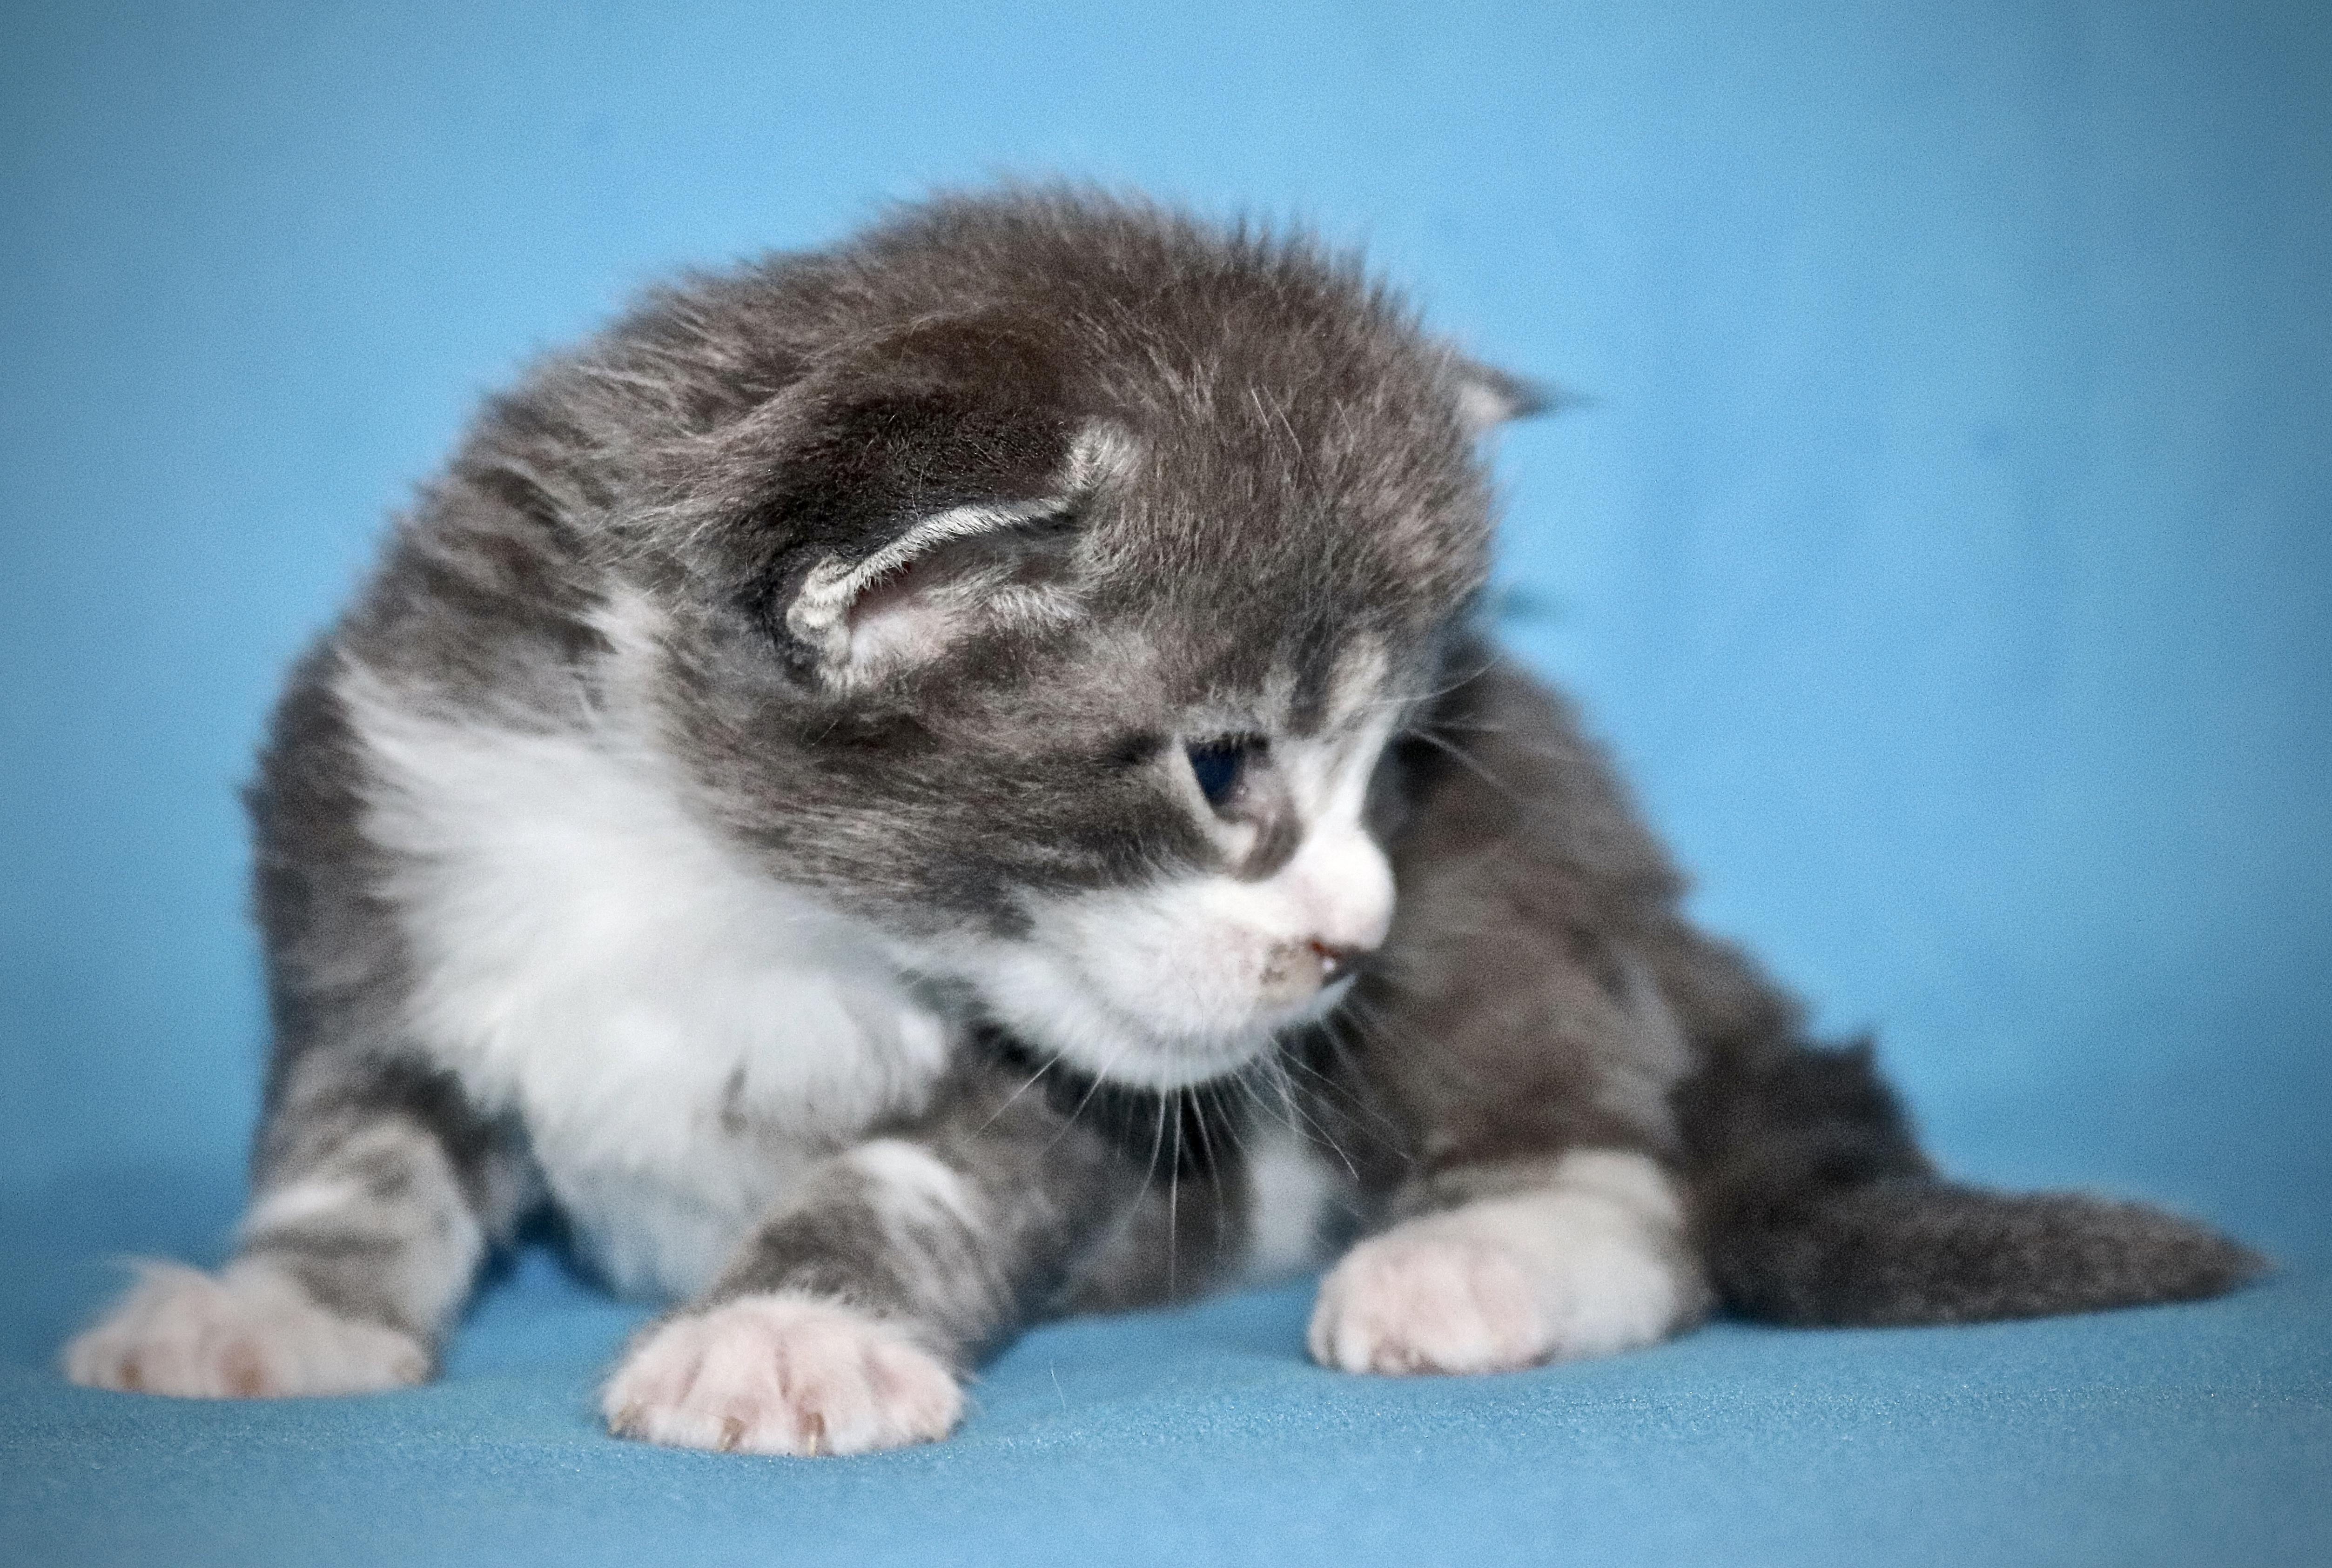 fotka kočky VRH J: JOHANKA VON ERILLIAN*CZ